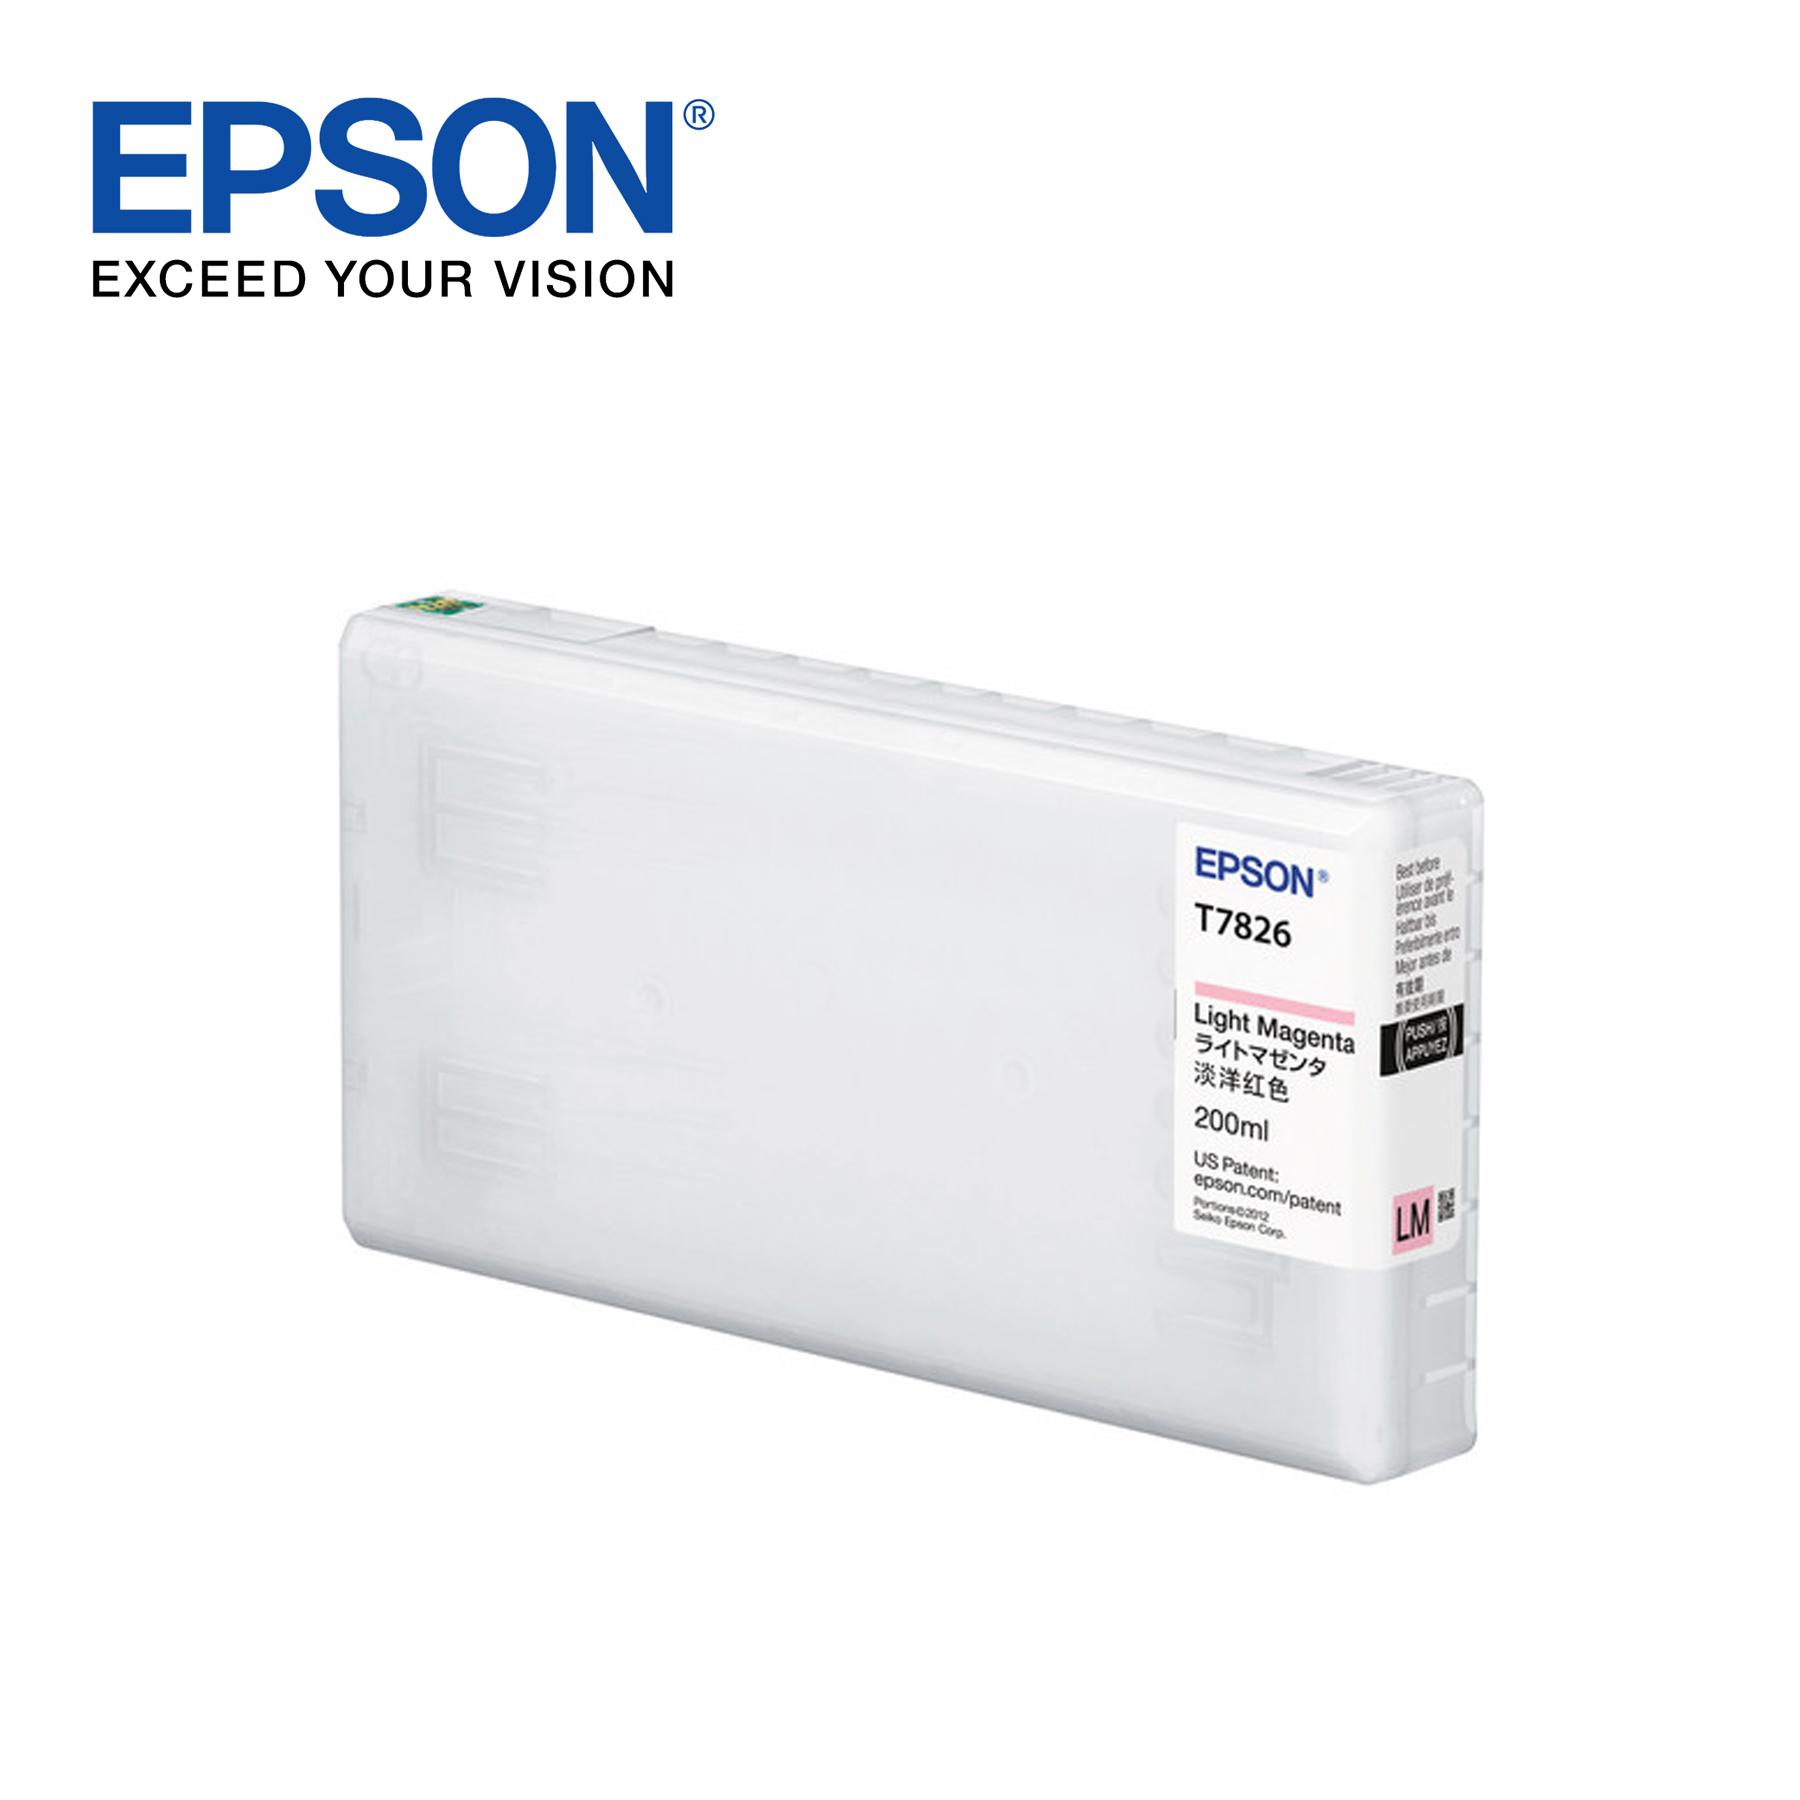 Epson Ink Cartridge for Surelab SL-D700 Photo Printer – Light Magenta